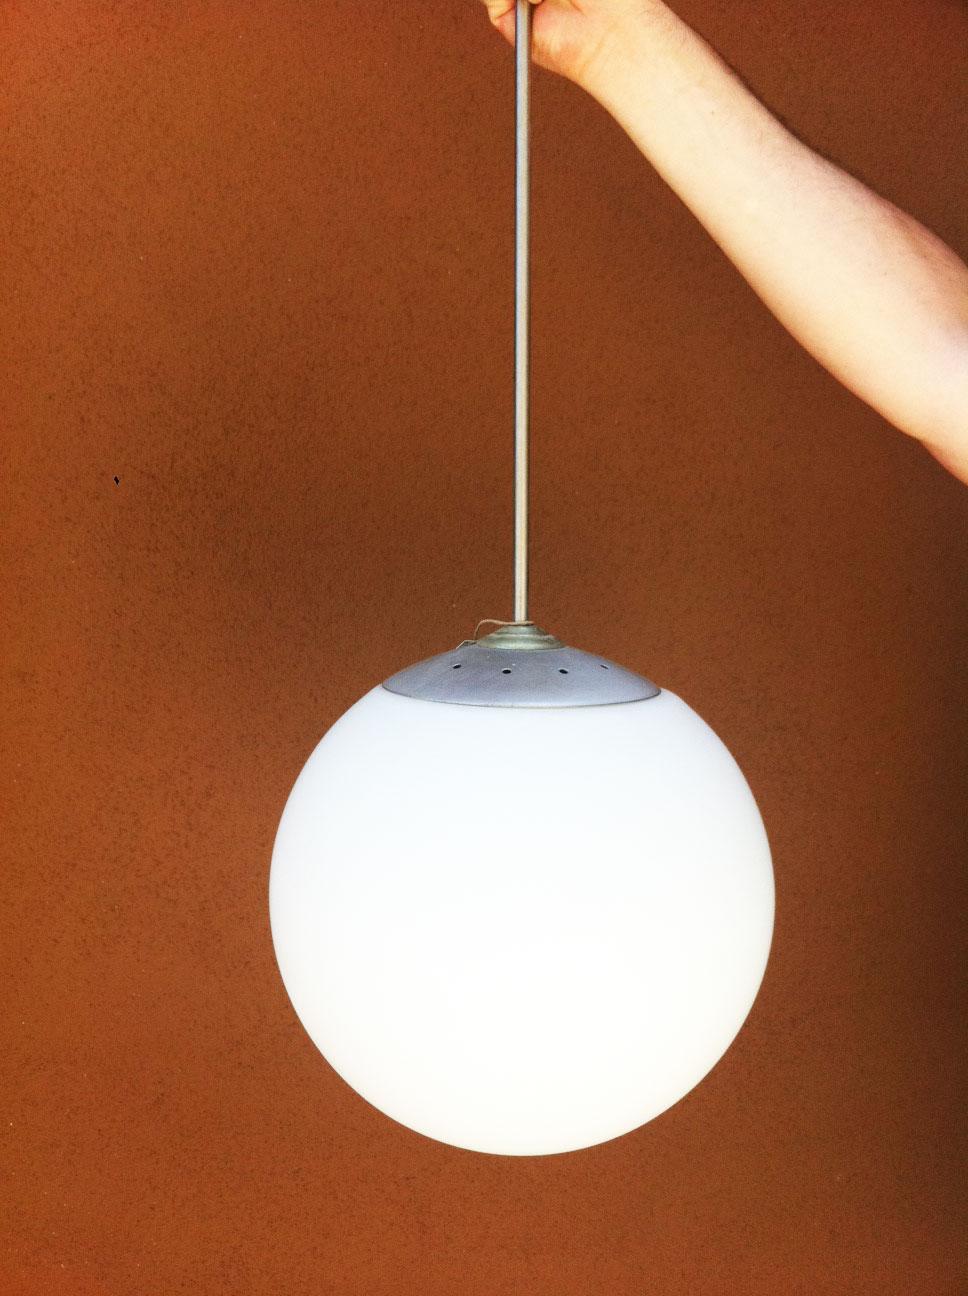 Mid Century Modern Globe Pendant Light Fixture Sold Very